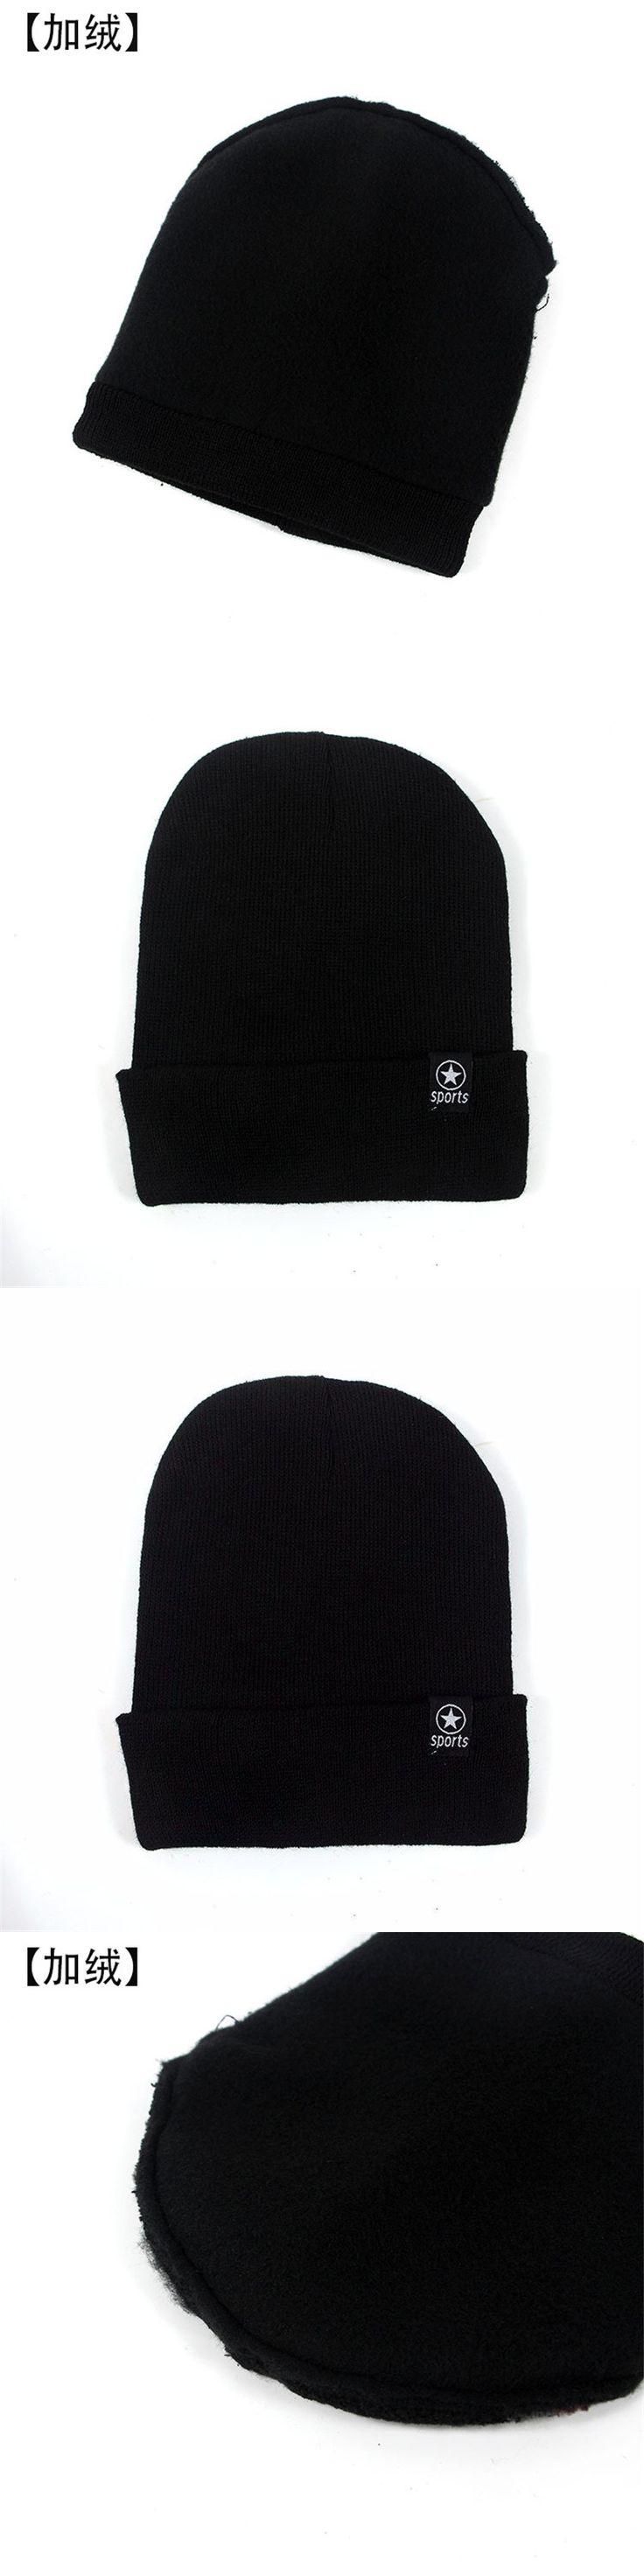 Casual Star Sports Black Beanies Knitted Hat Men's Winter Hats For Men Caps Warm Fur Winter Beanie Fleece Knit Ski Bonnet Hat